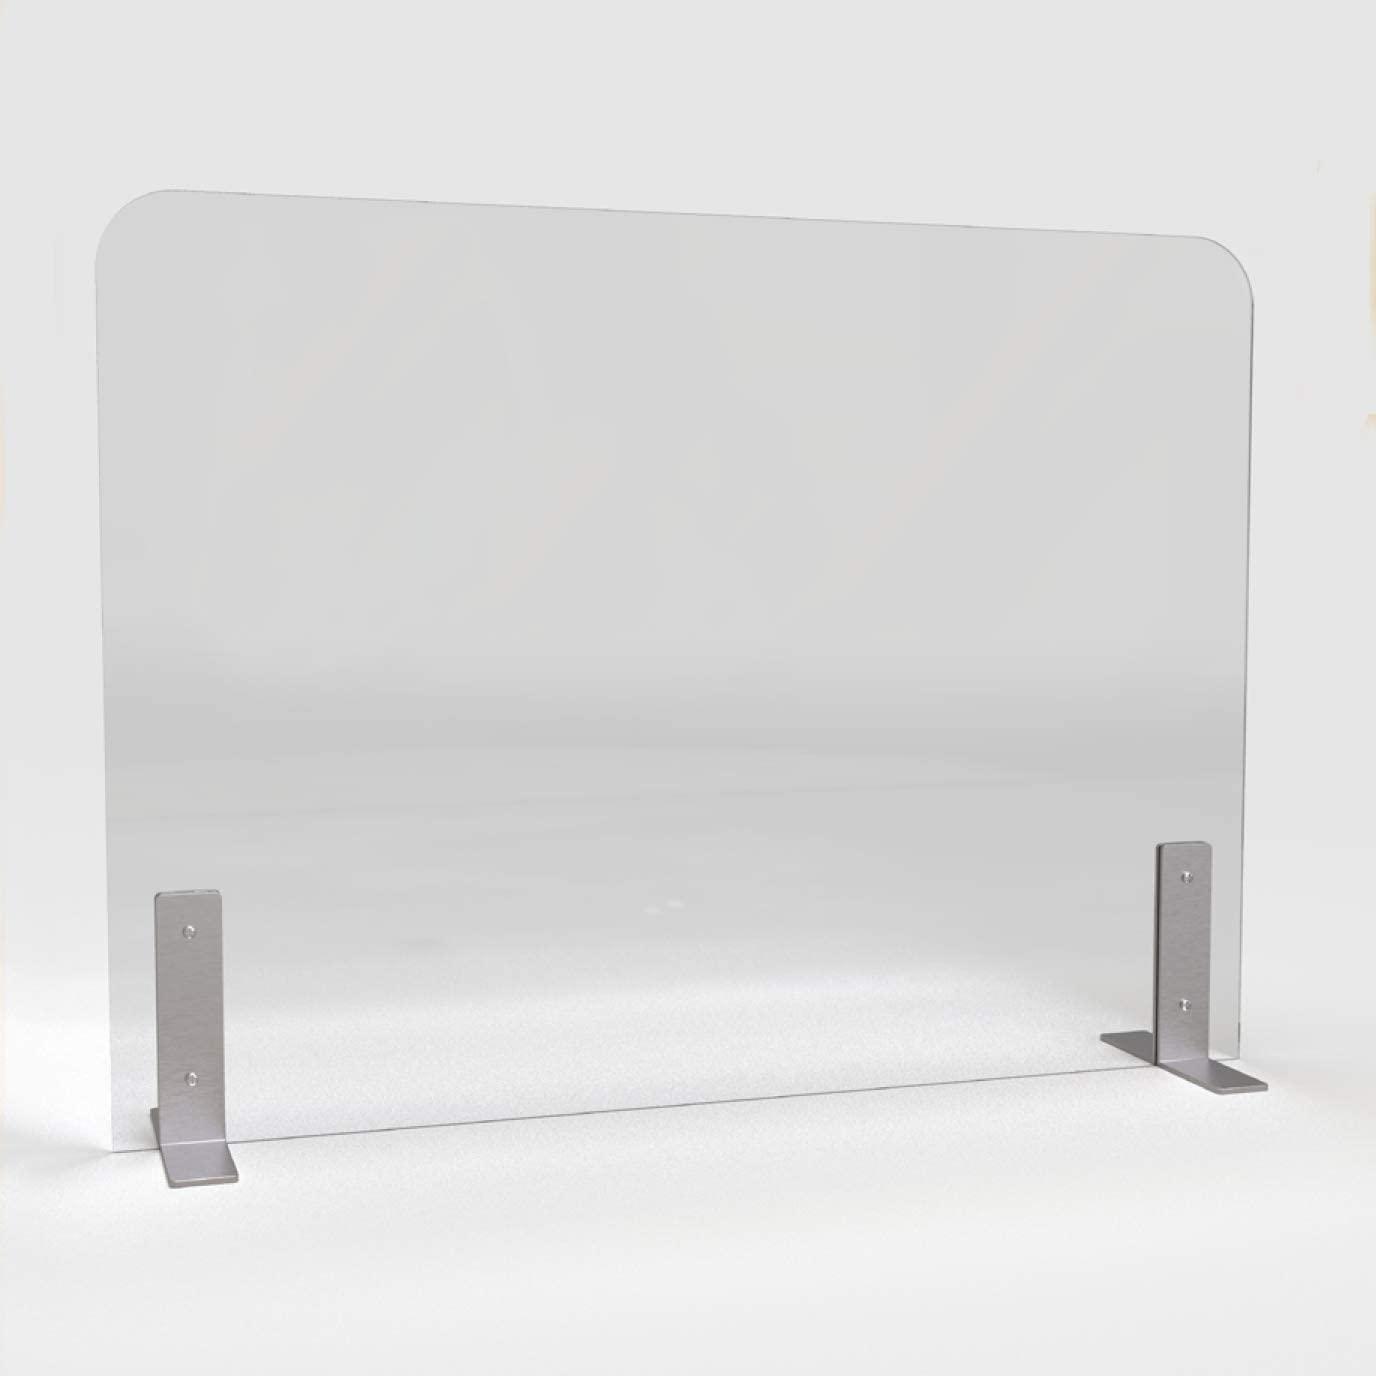 Playwood.it Safety Wall Plexiglass antibatterici per attivit/à Commerciali 99x66 cm barriera Protettiva Protezione Emergenza